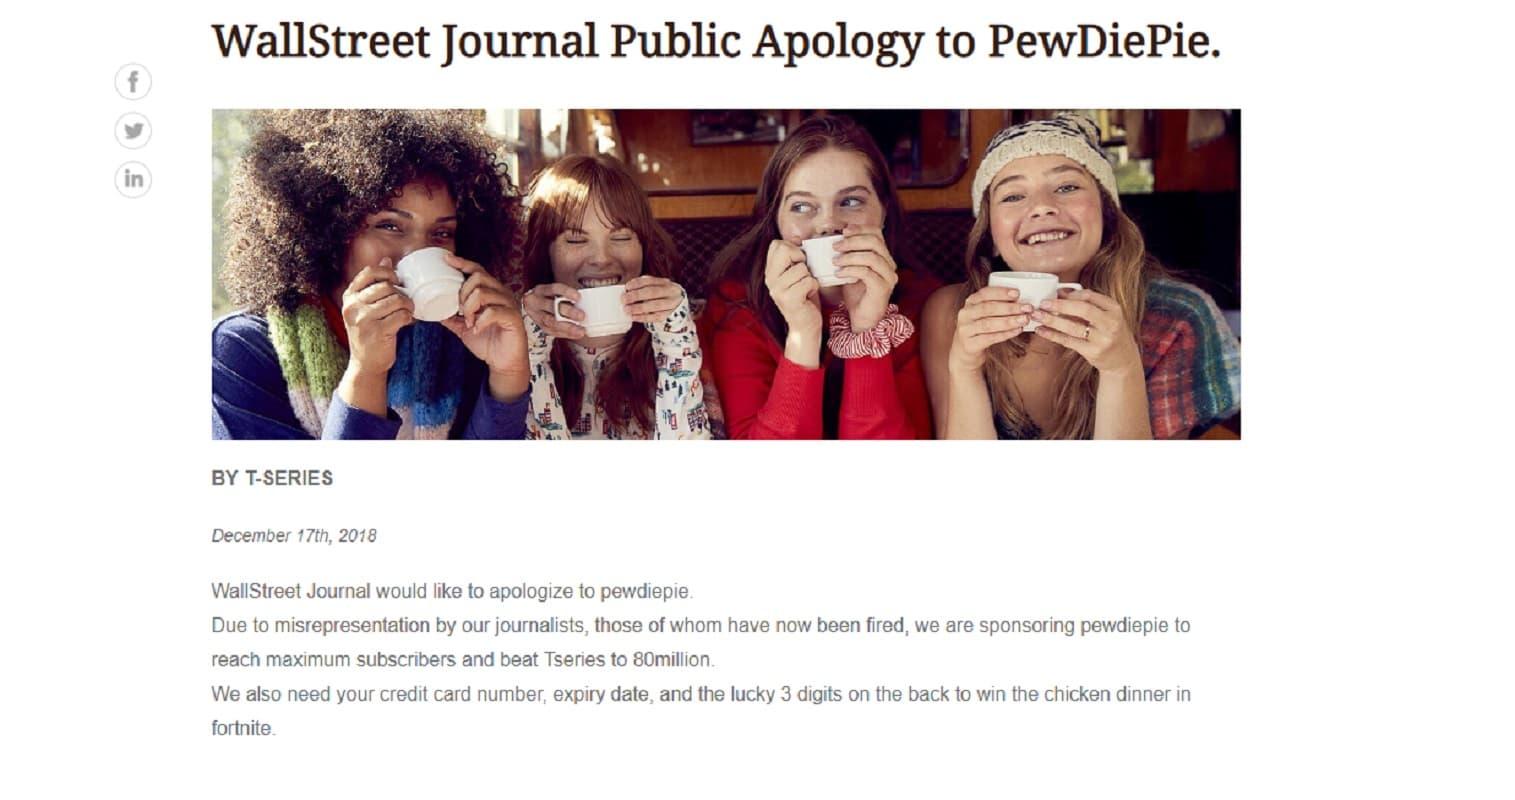 screenshot of hacked wall street journal ad promoting pewdiepie